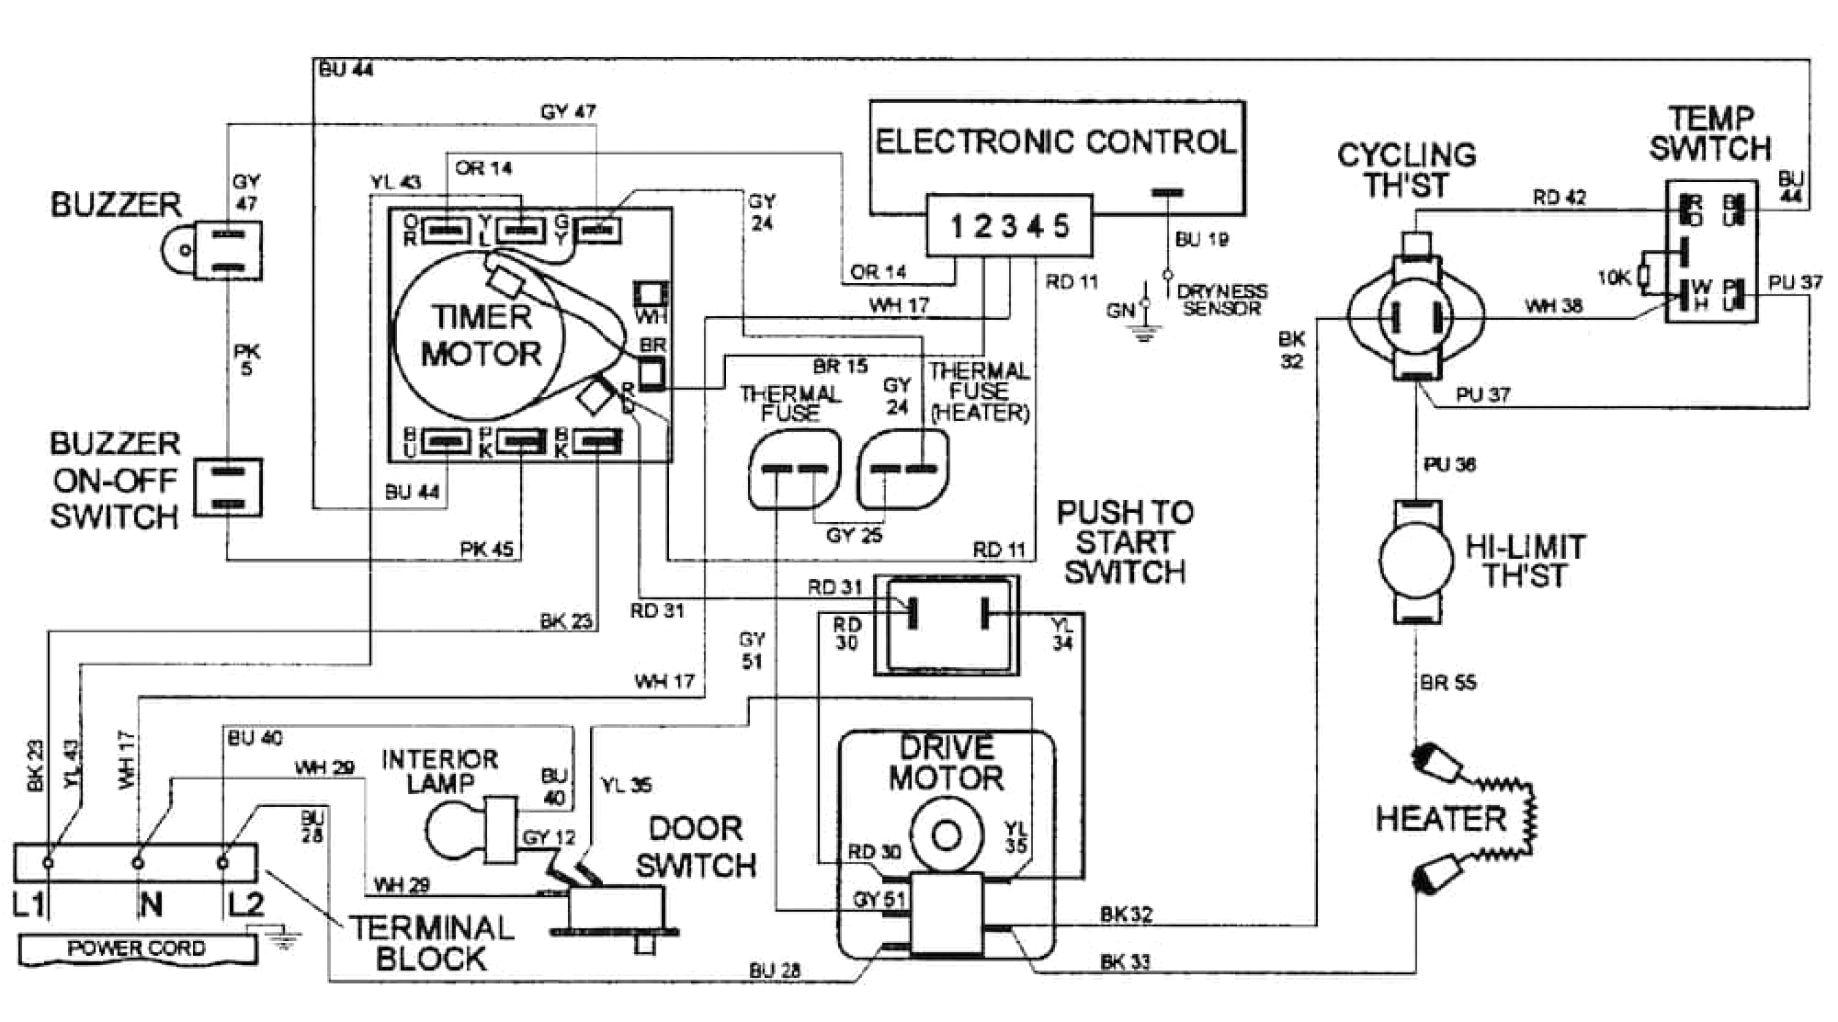 dexter wire diagram wiring diagram user dexter dryer motor wiring diagram